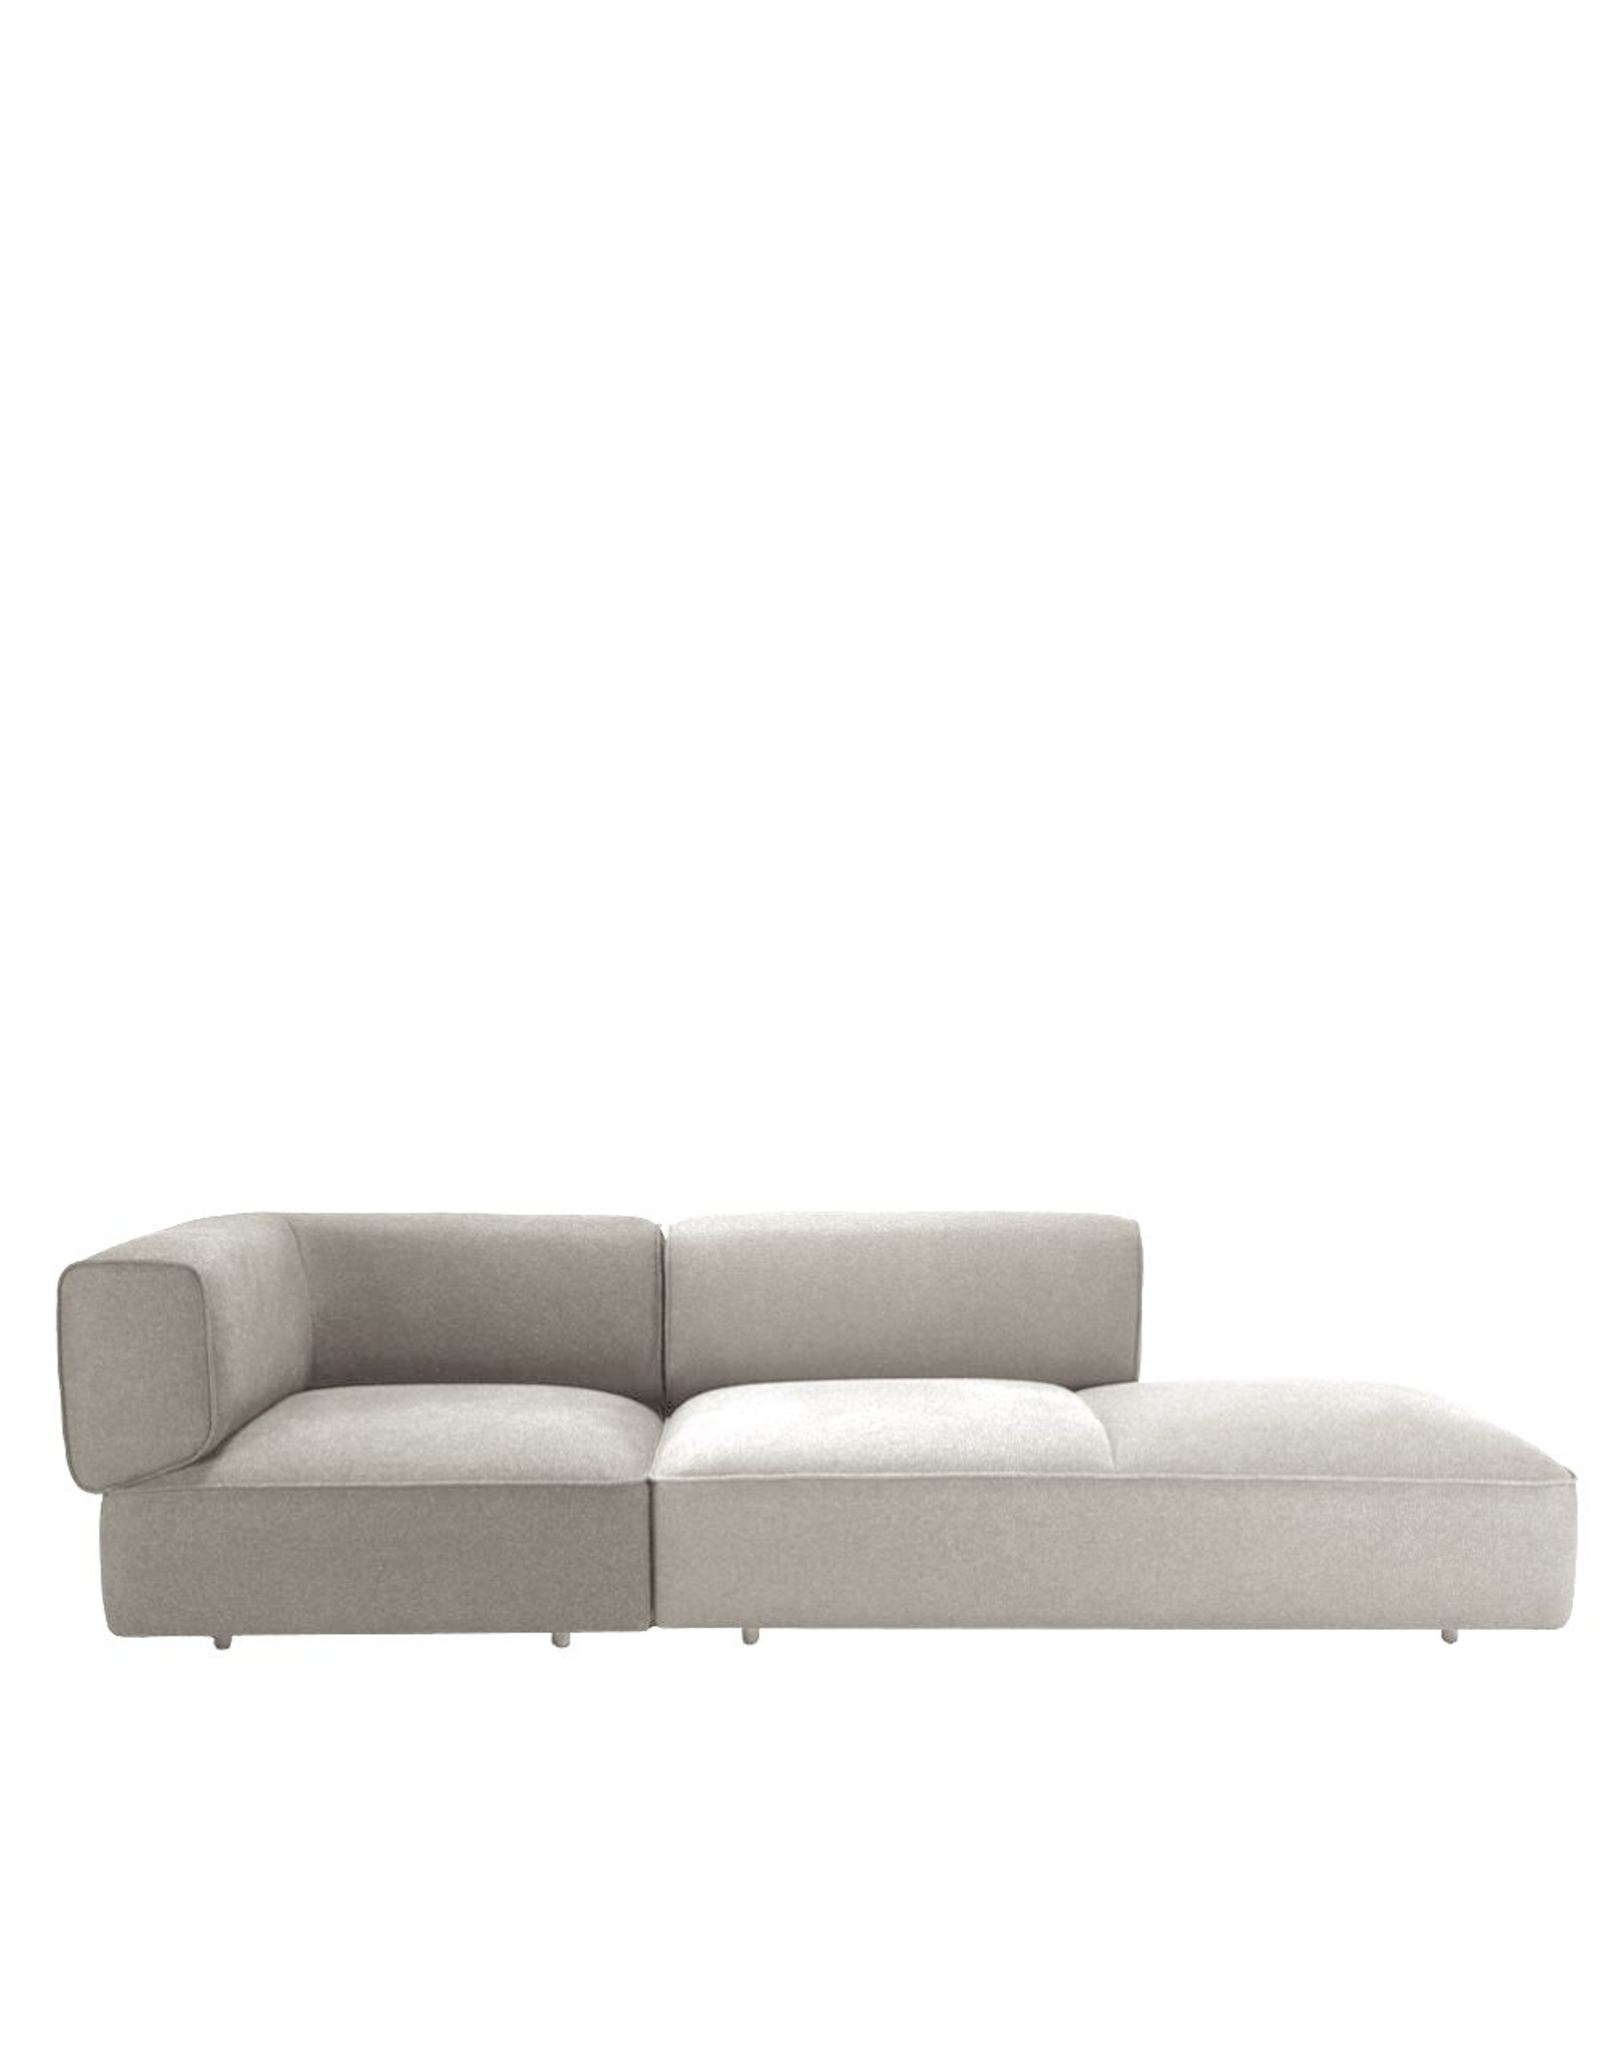 POFF 沙发